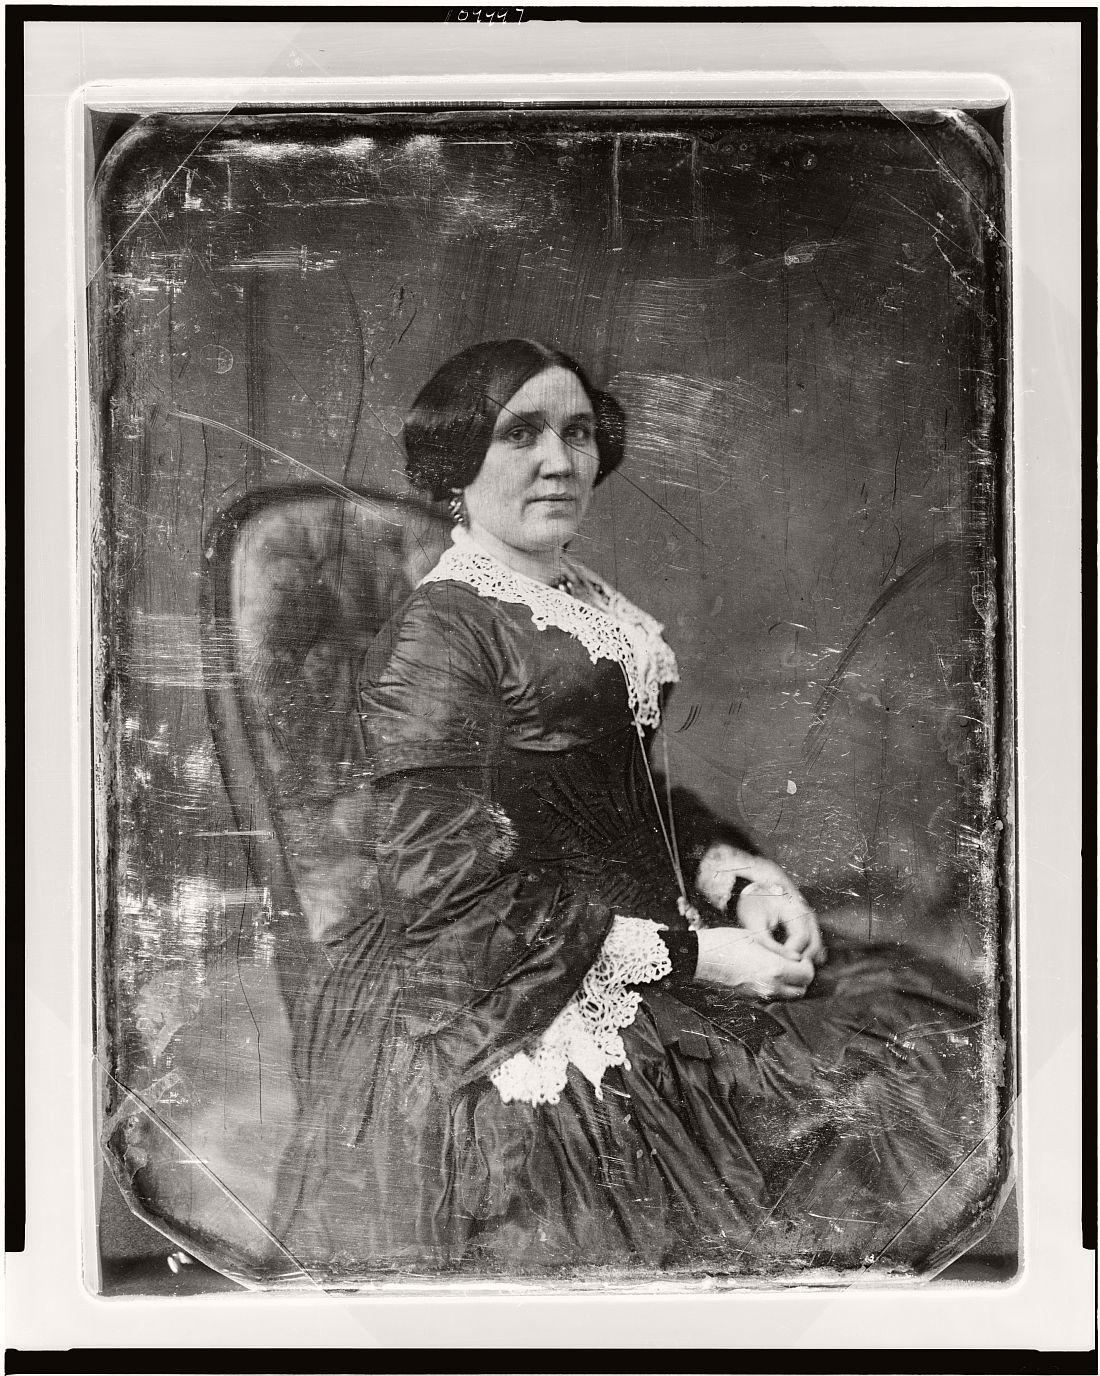 vintage-daguerreotype-portraits-from-xix-century-1844-1860-42